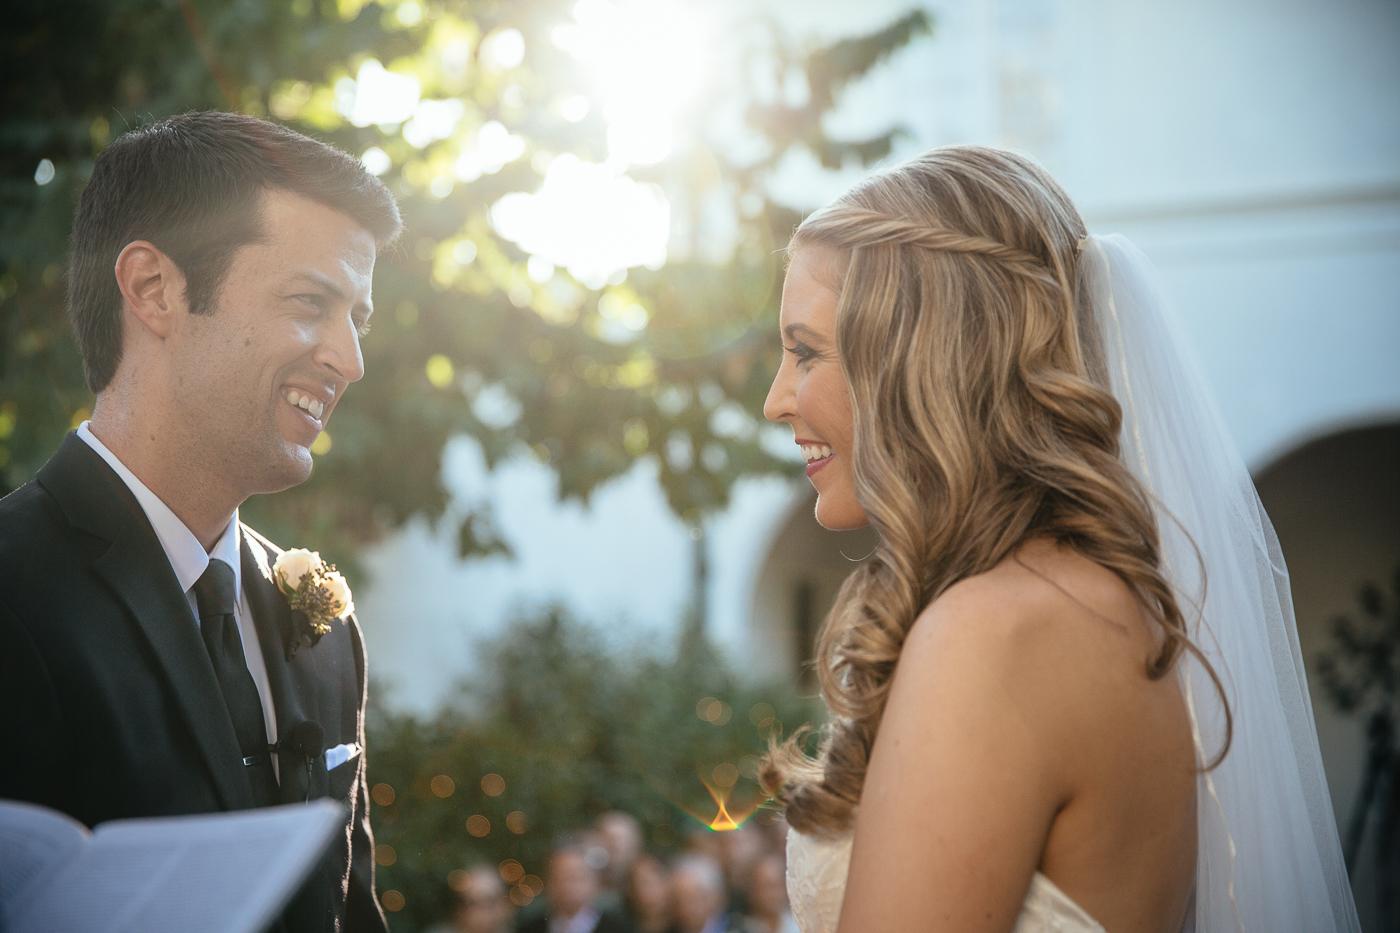 RYAN_&_KELLEY_DARLINGTON_HOUSE_WEDDING_2014_7X9A2076.JPG